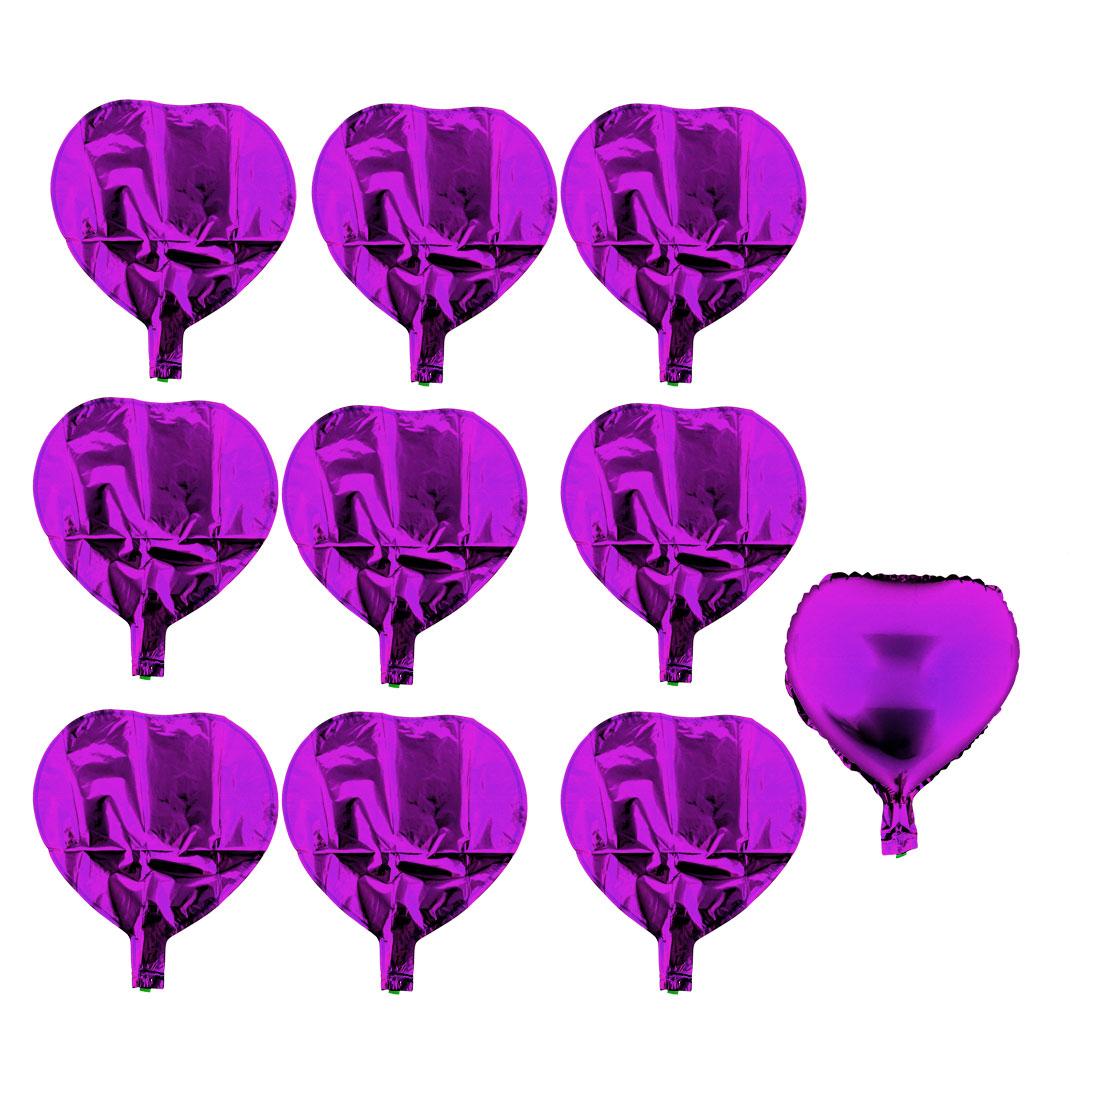 Christmas Festival Party Foil Heart Shaped Decoration Balloon Love Balloons Purple 10 PCS